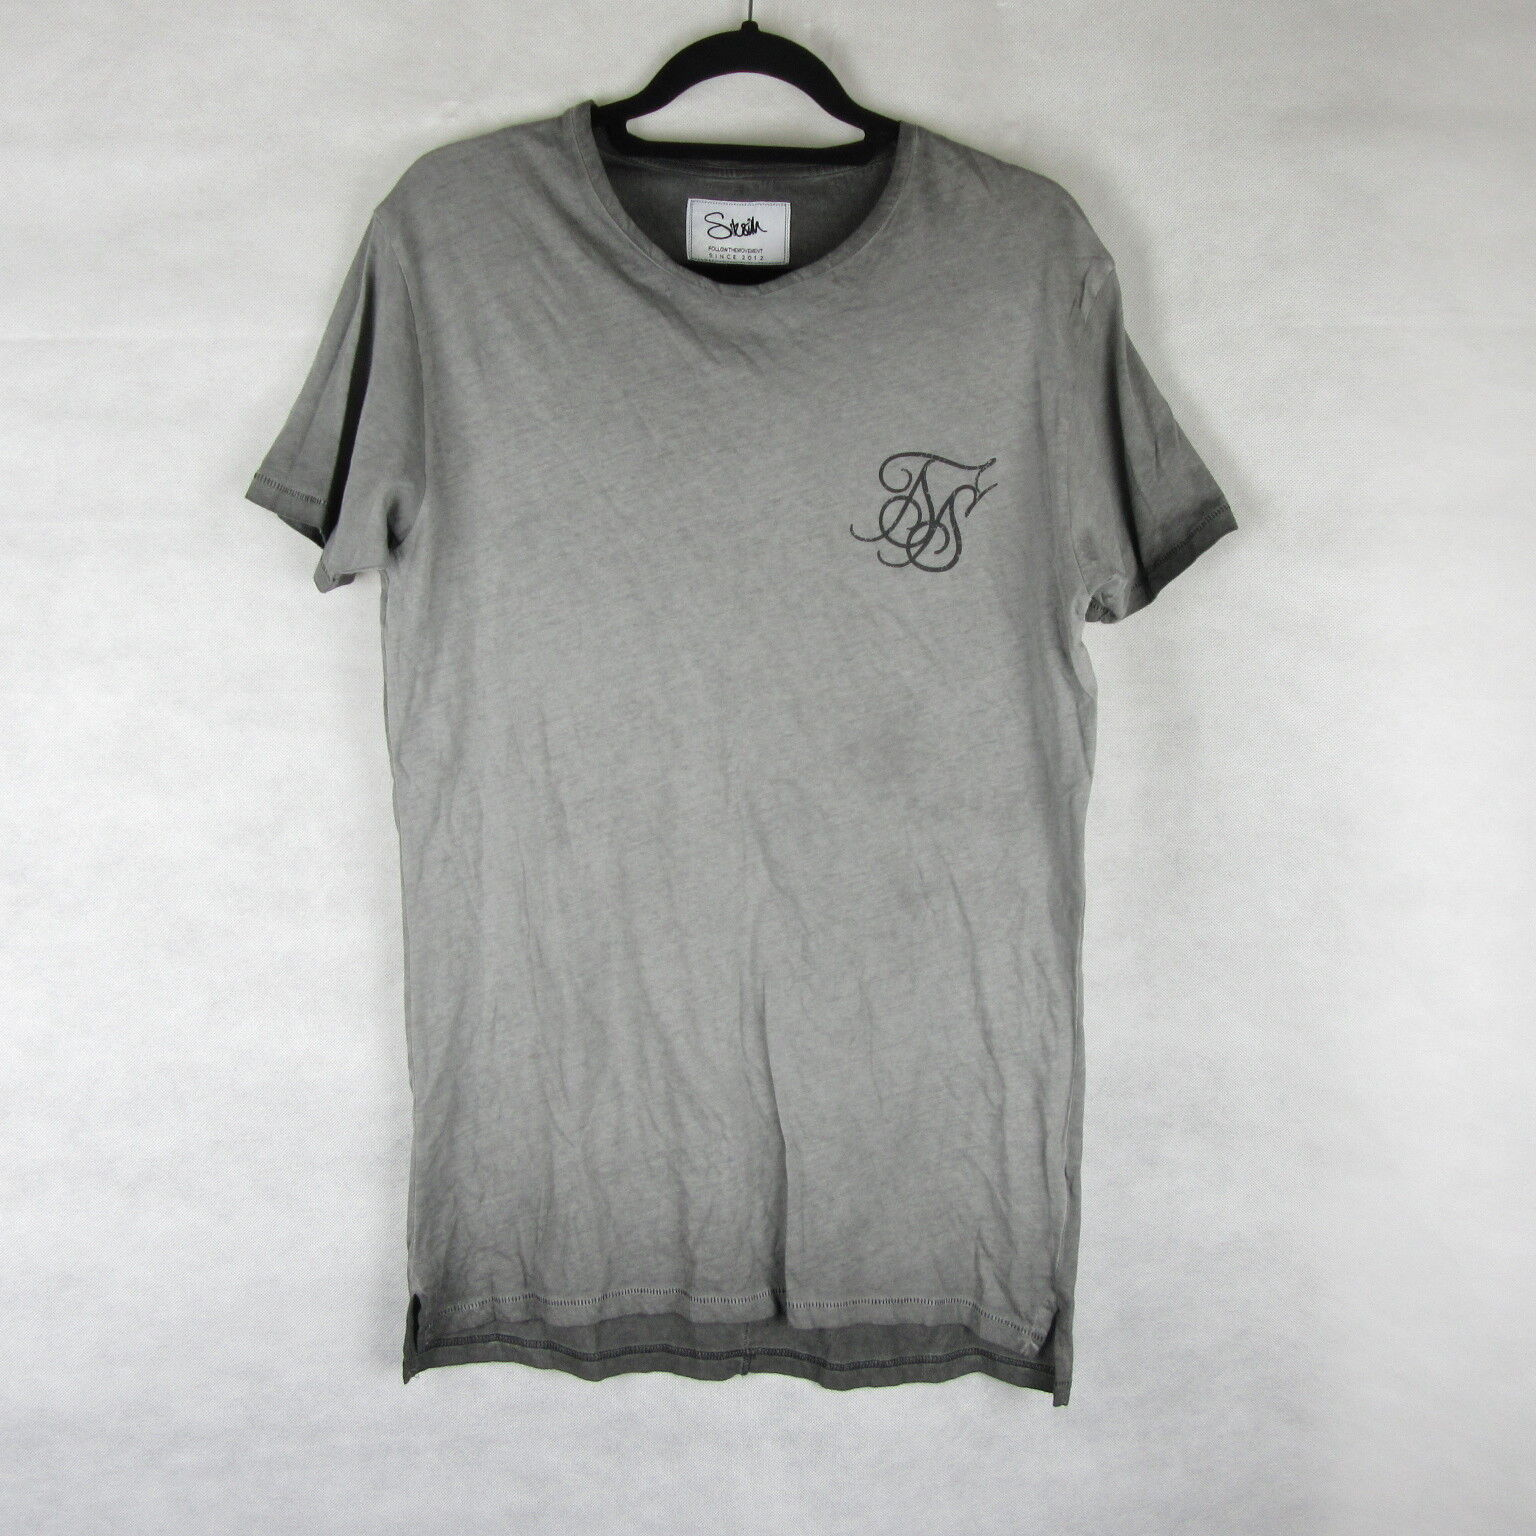 Sik Seta T Shirt Palestra Running Grigio Taglia S